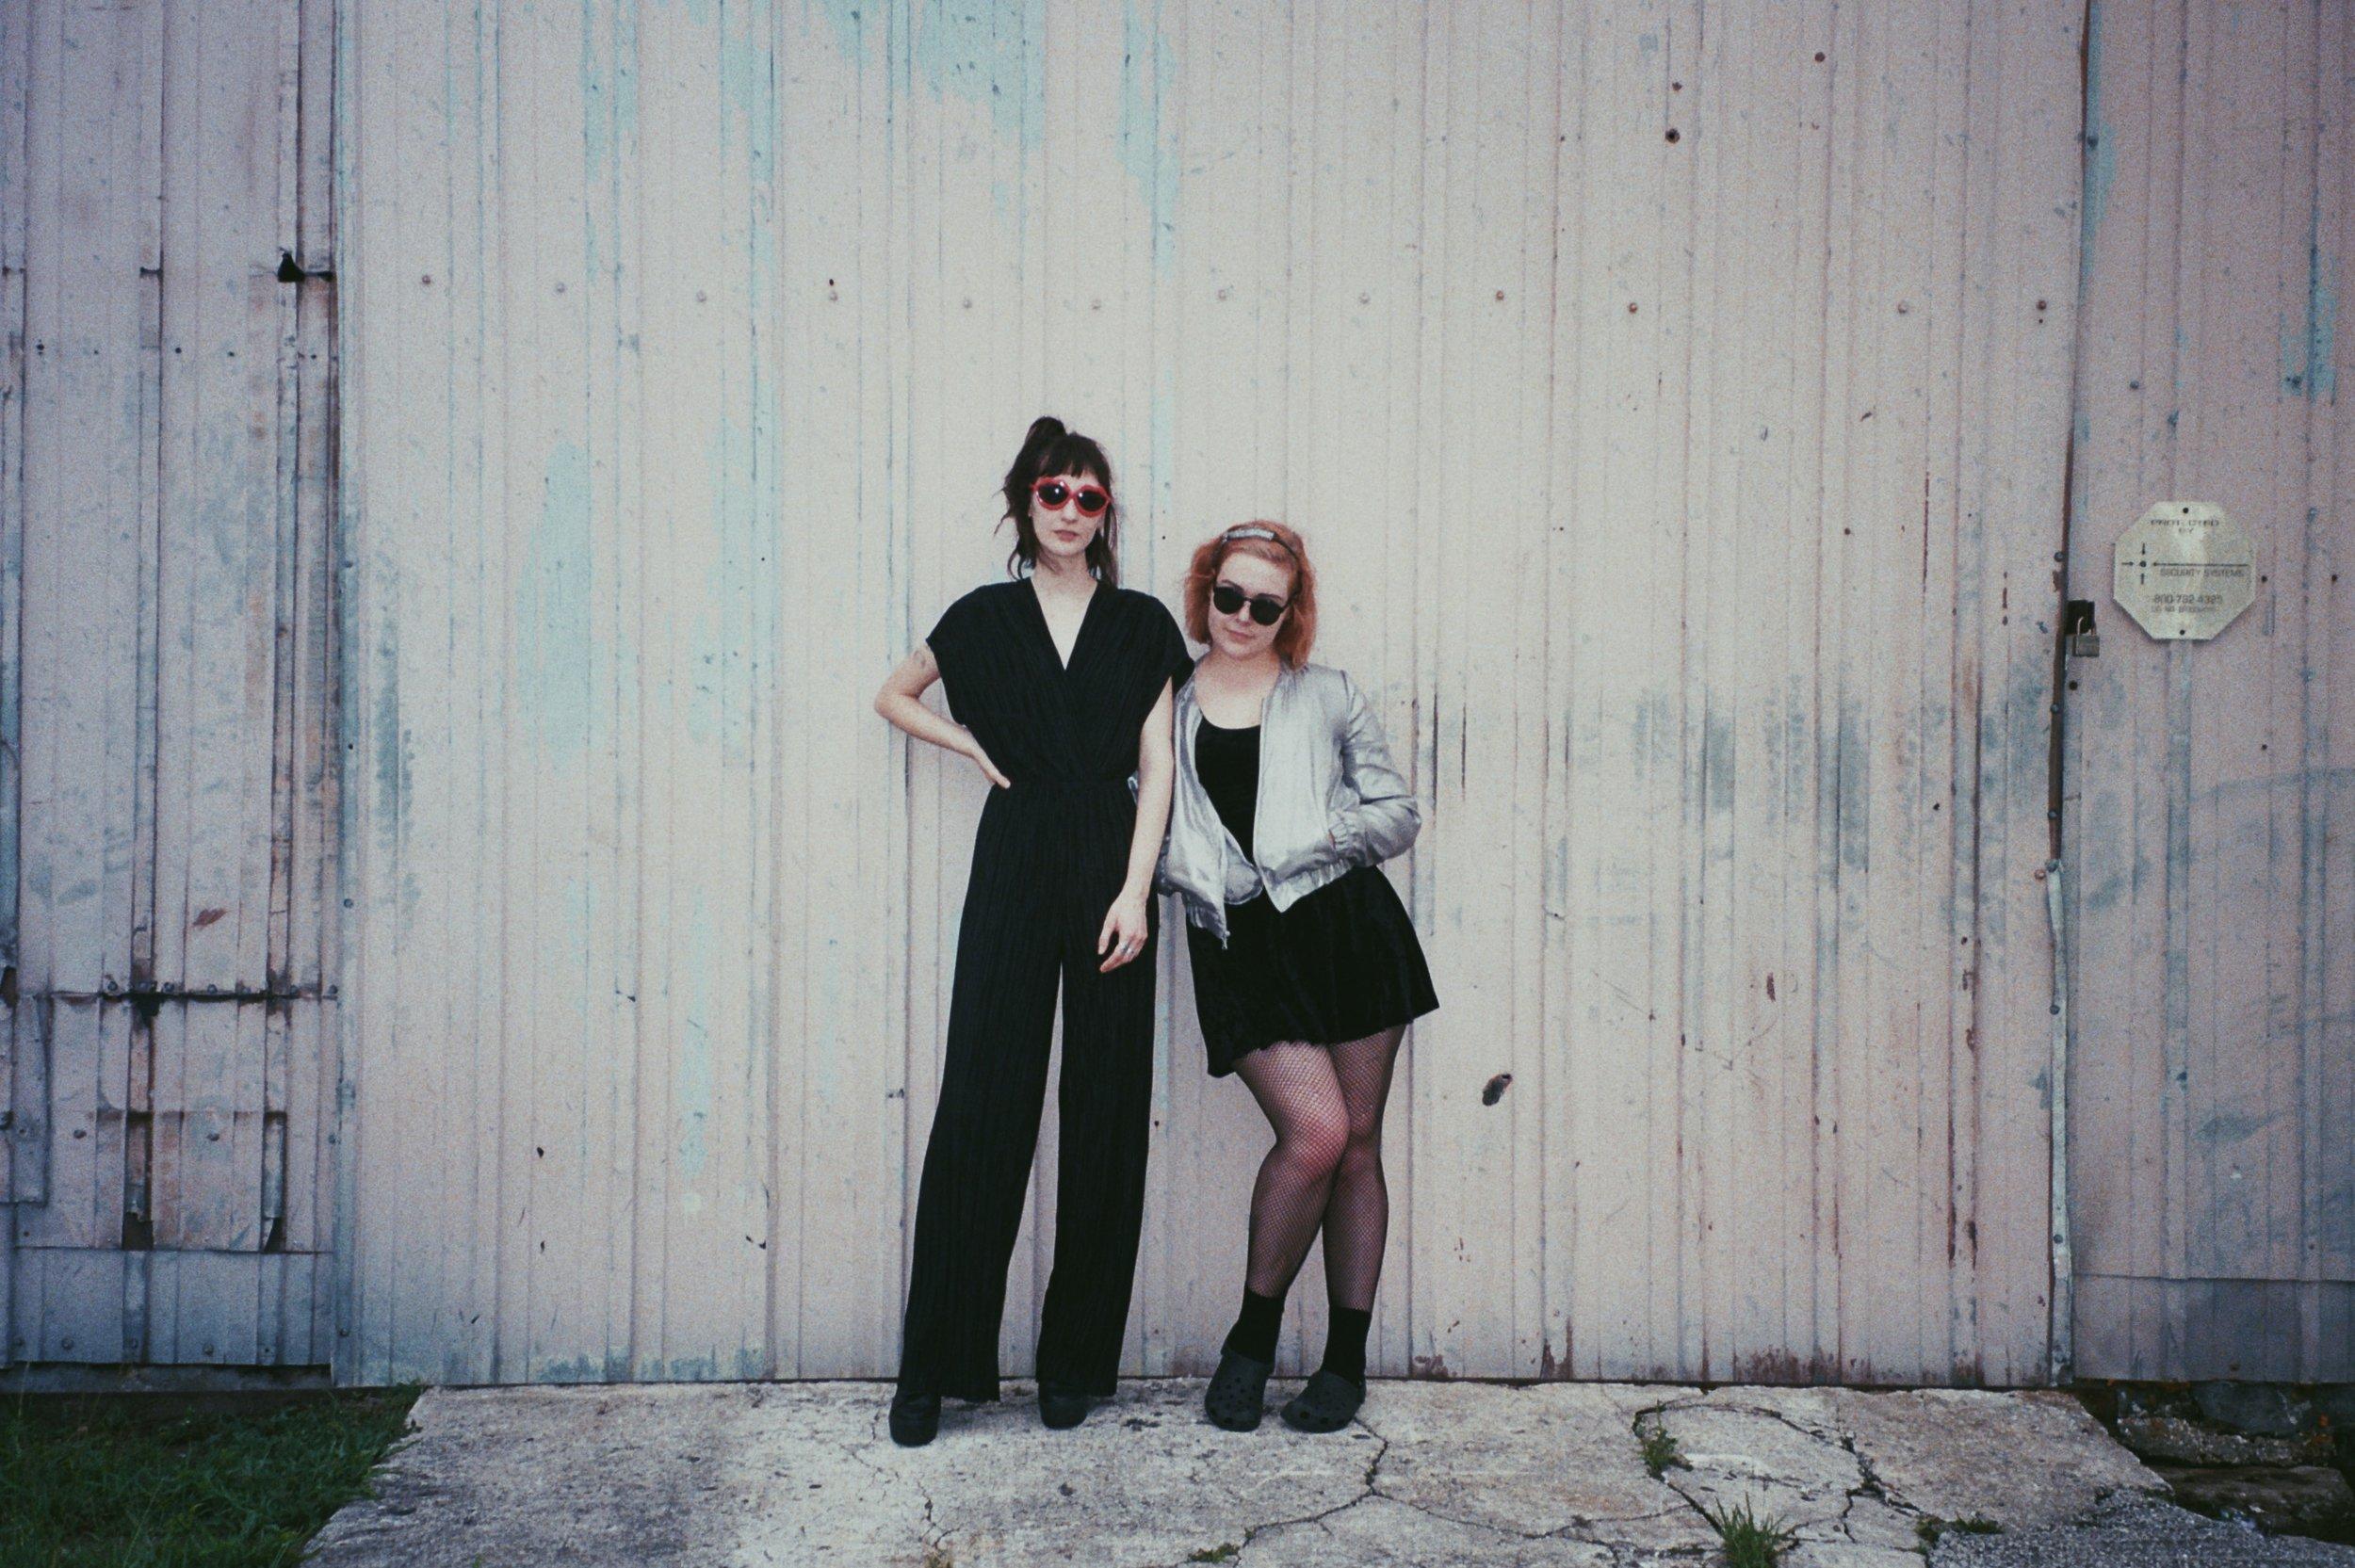 TV Dinner Band Interview | The Vinyl Warhol | Orlando Music Art Interview Blog